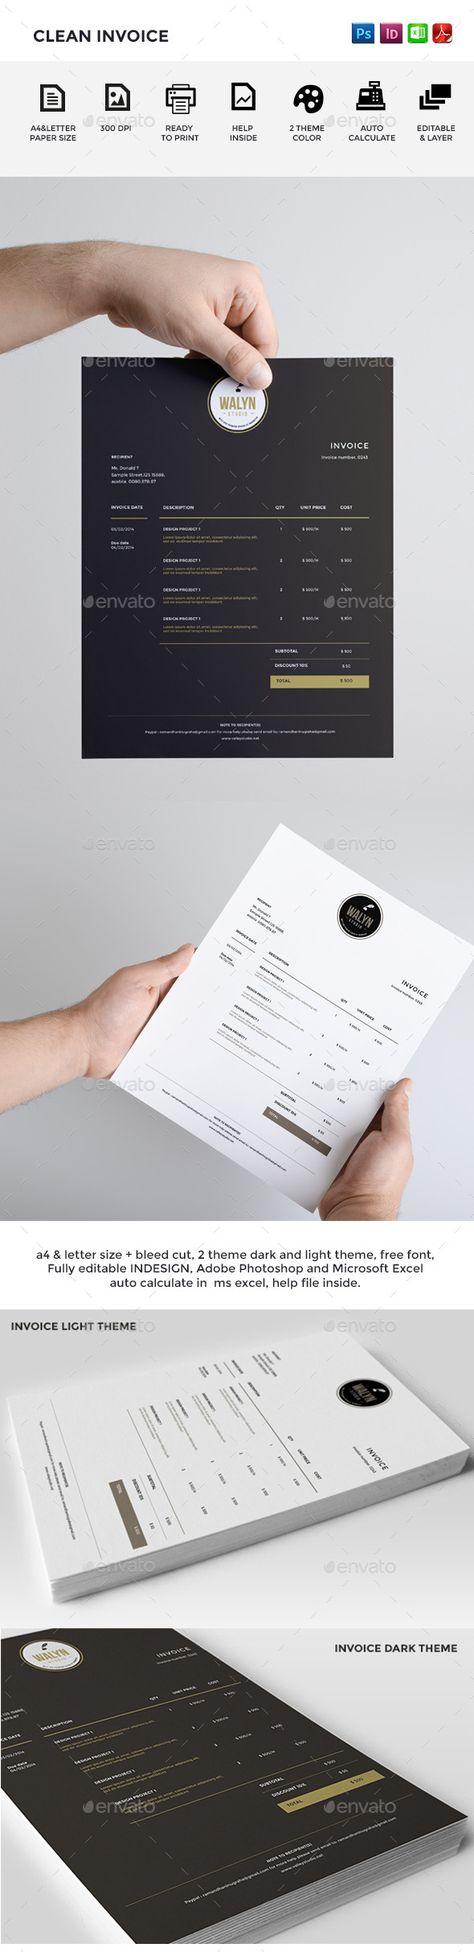 Invoice Template | Invoice Design | Receipt | MS Word Invoice ...